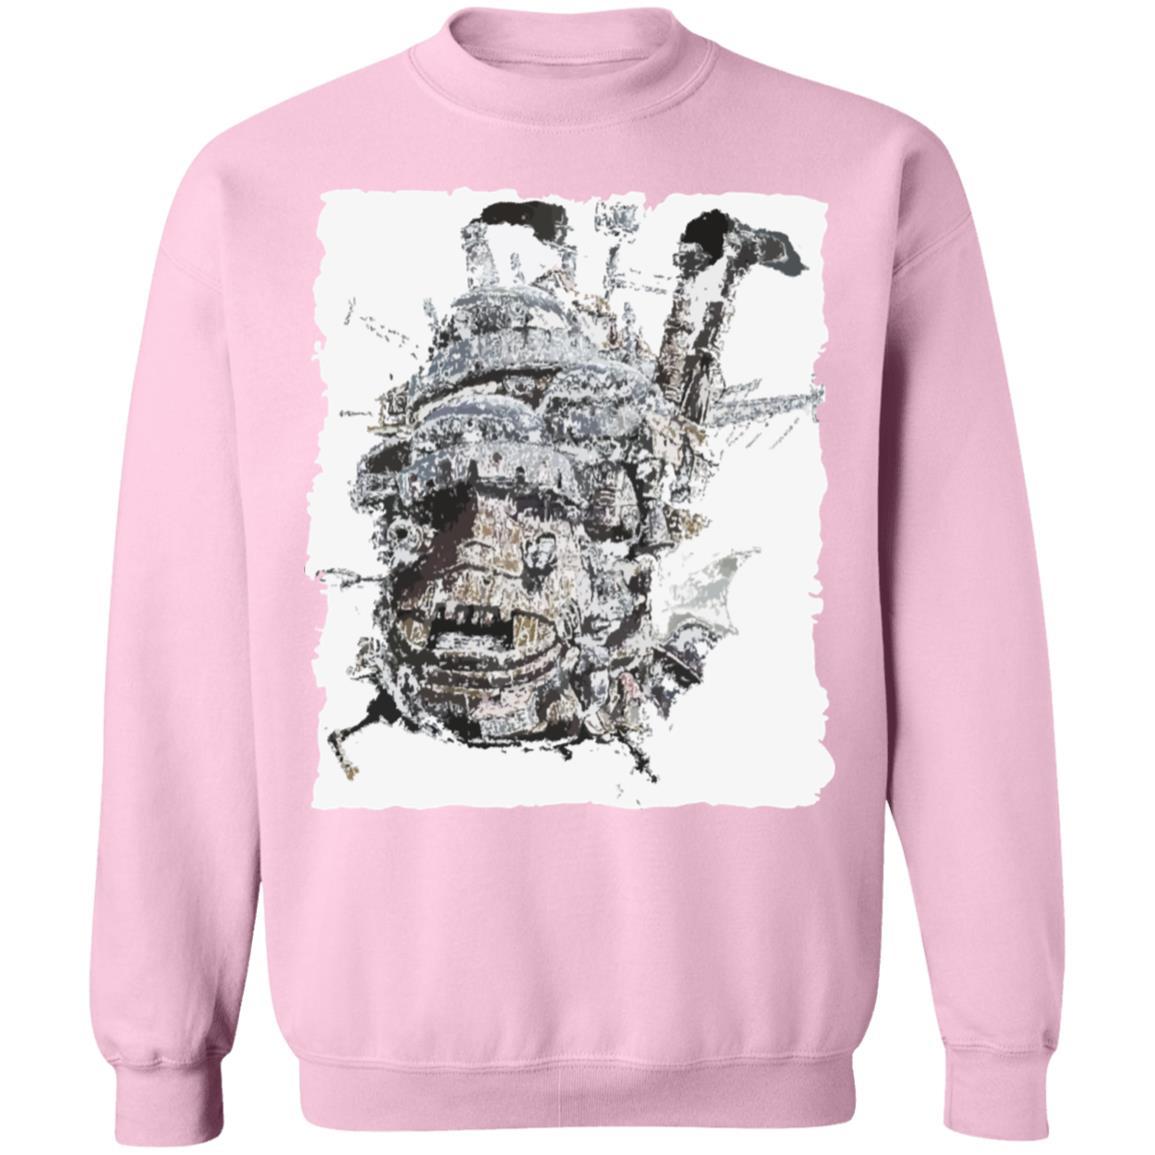 Howl's moving castle Essential Sweatshirt Unisex